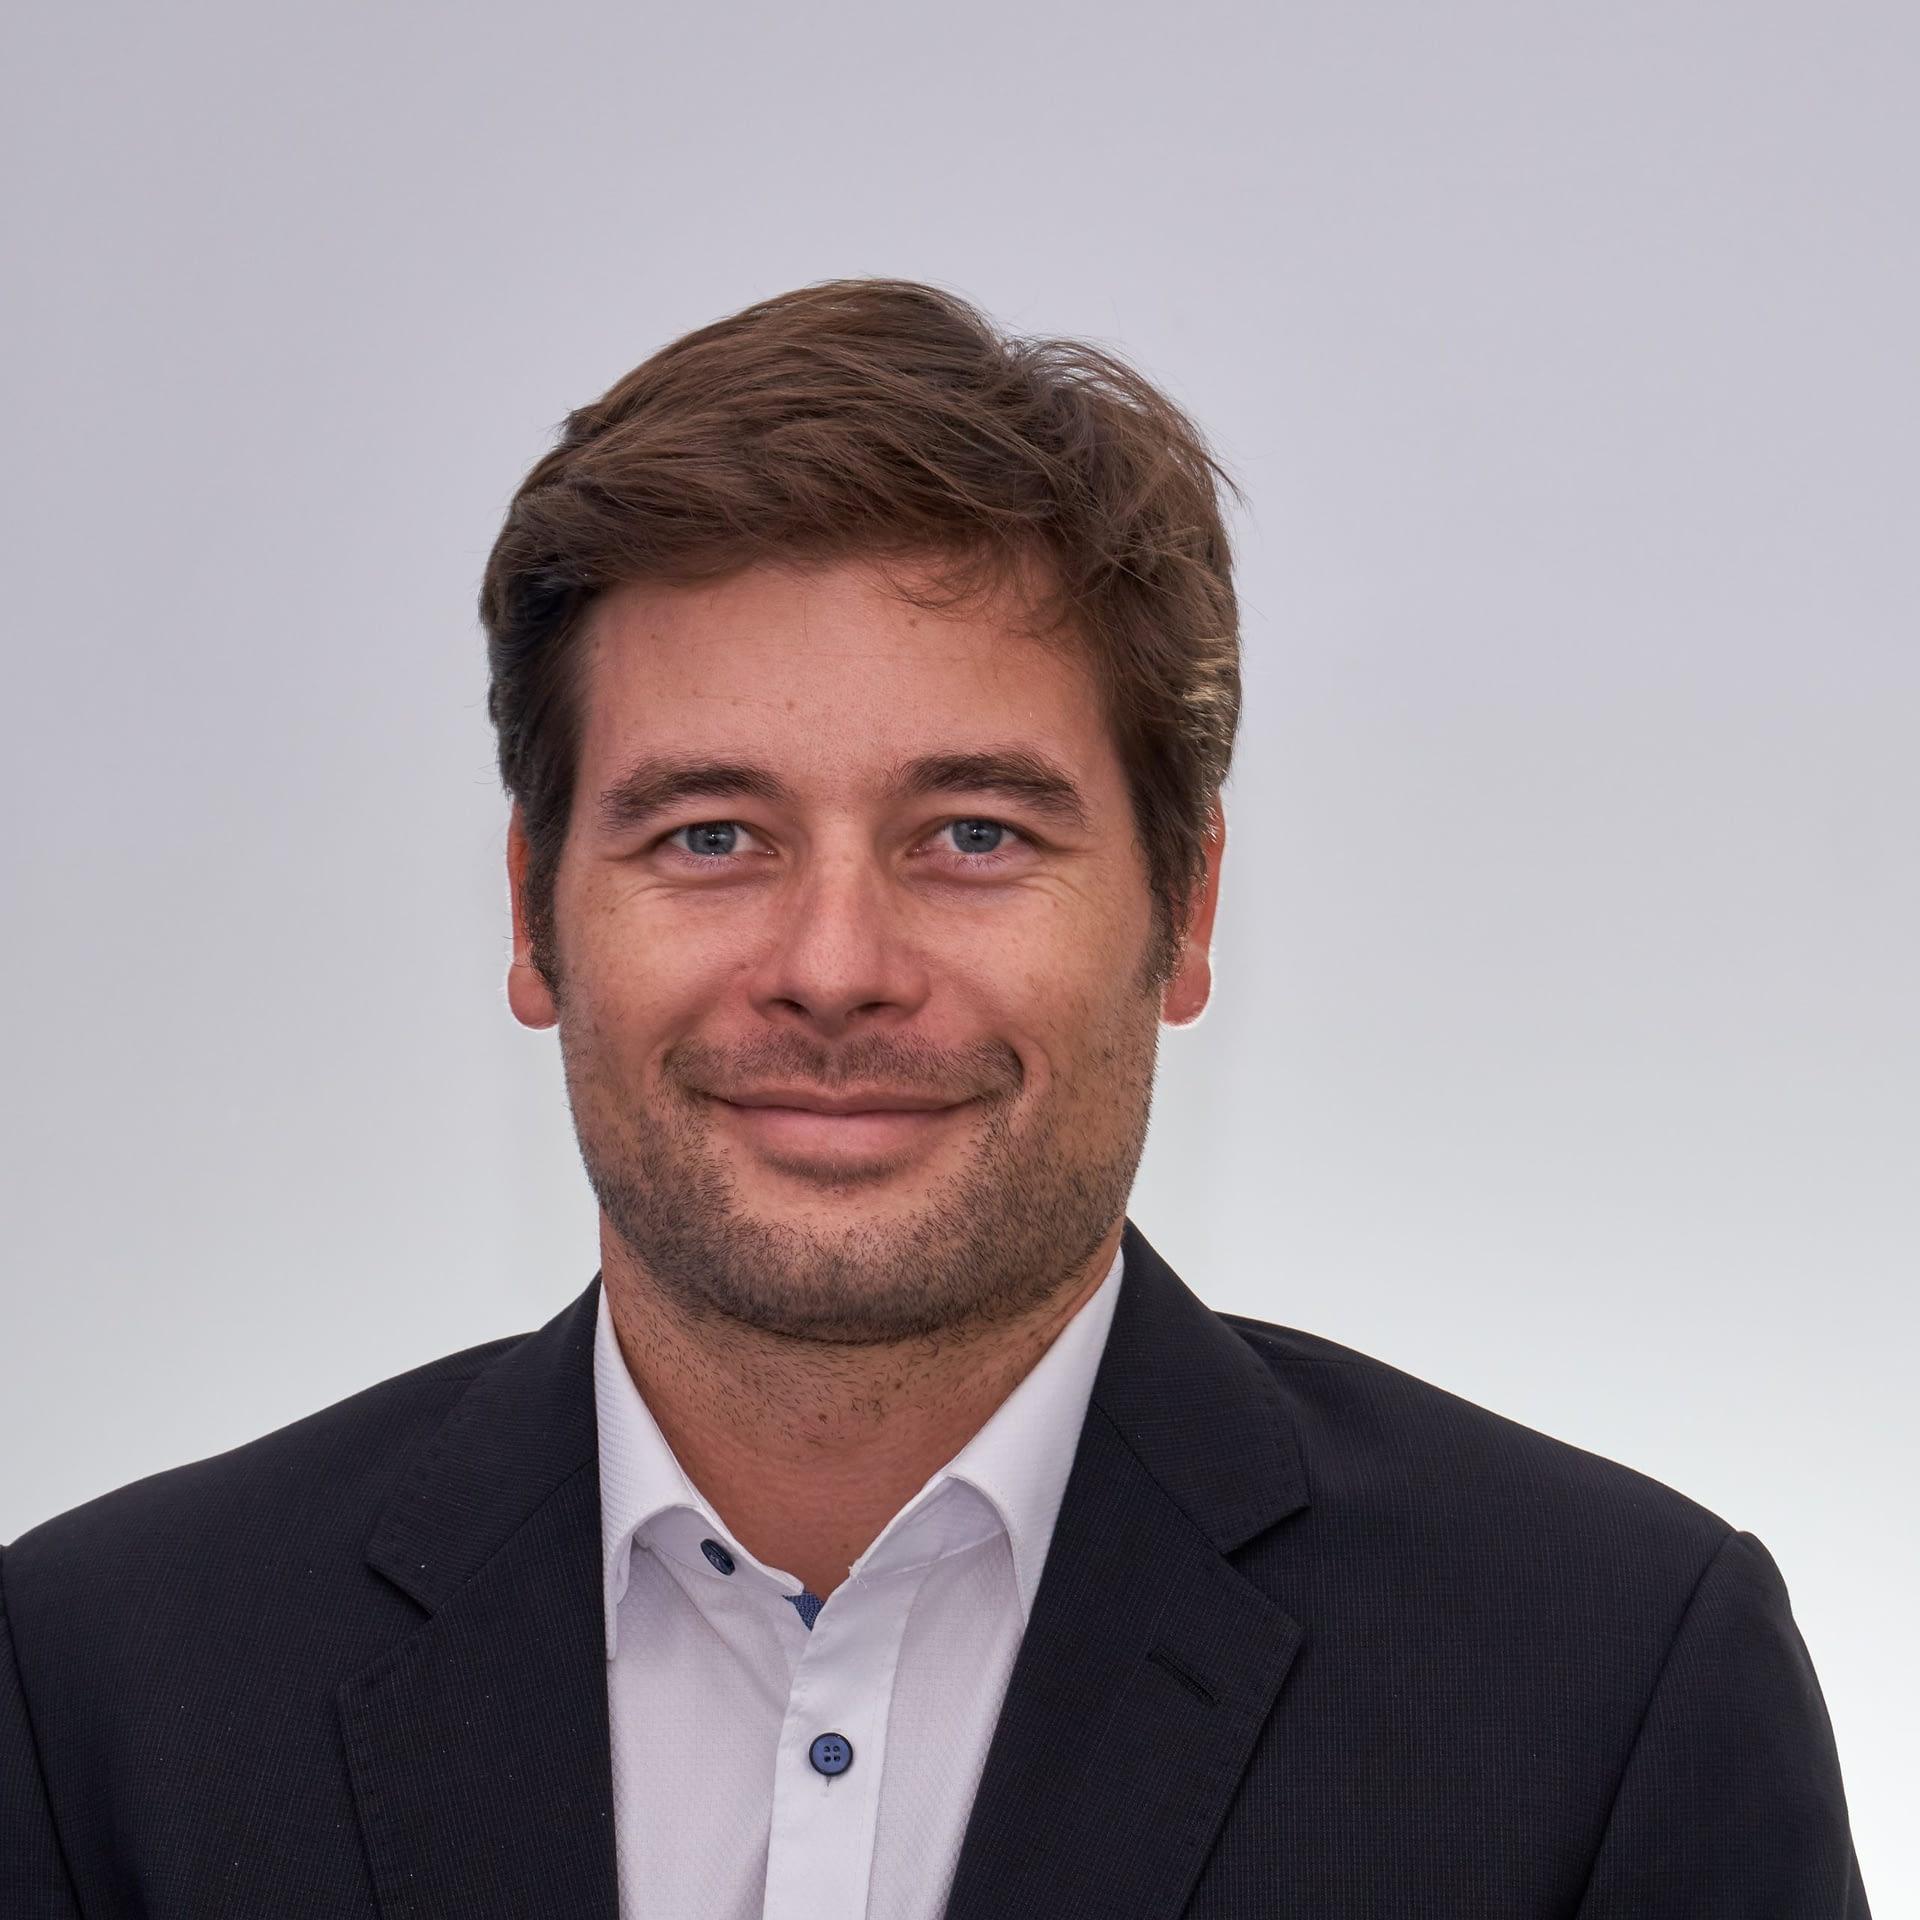 SciMo Dr. Florian Kassel